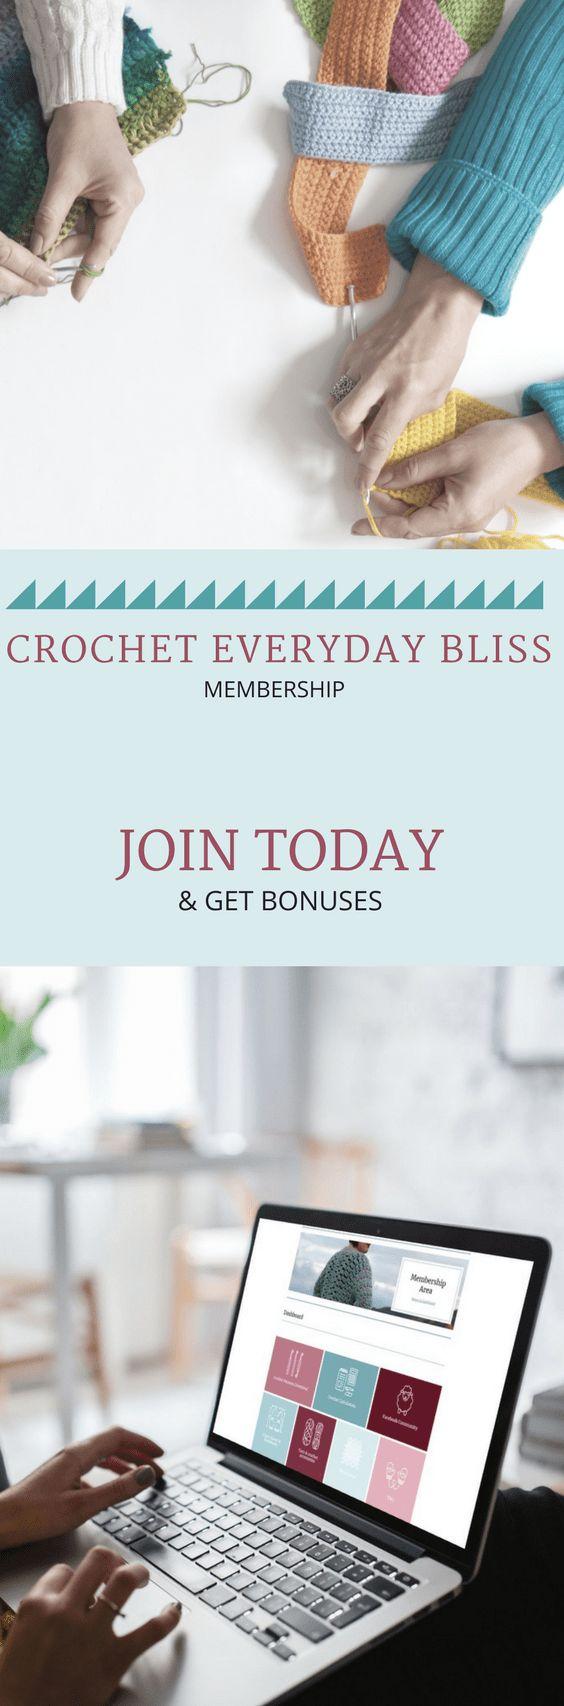 Crochet Everyday Bliss. A crochet membership. Crochet patterns. Crochet Calculators. Crochet Resources. Crochet community.   #crochetpattern #crochet #crochetcommunity #crocheteveryday #crocheteverydaybliss